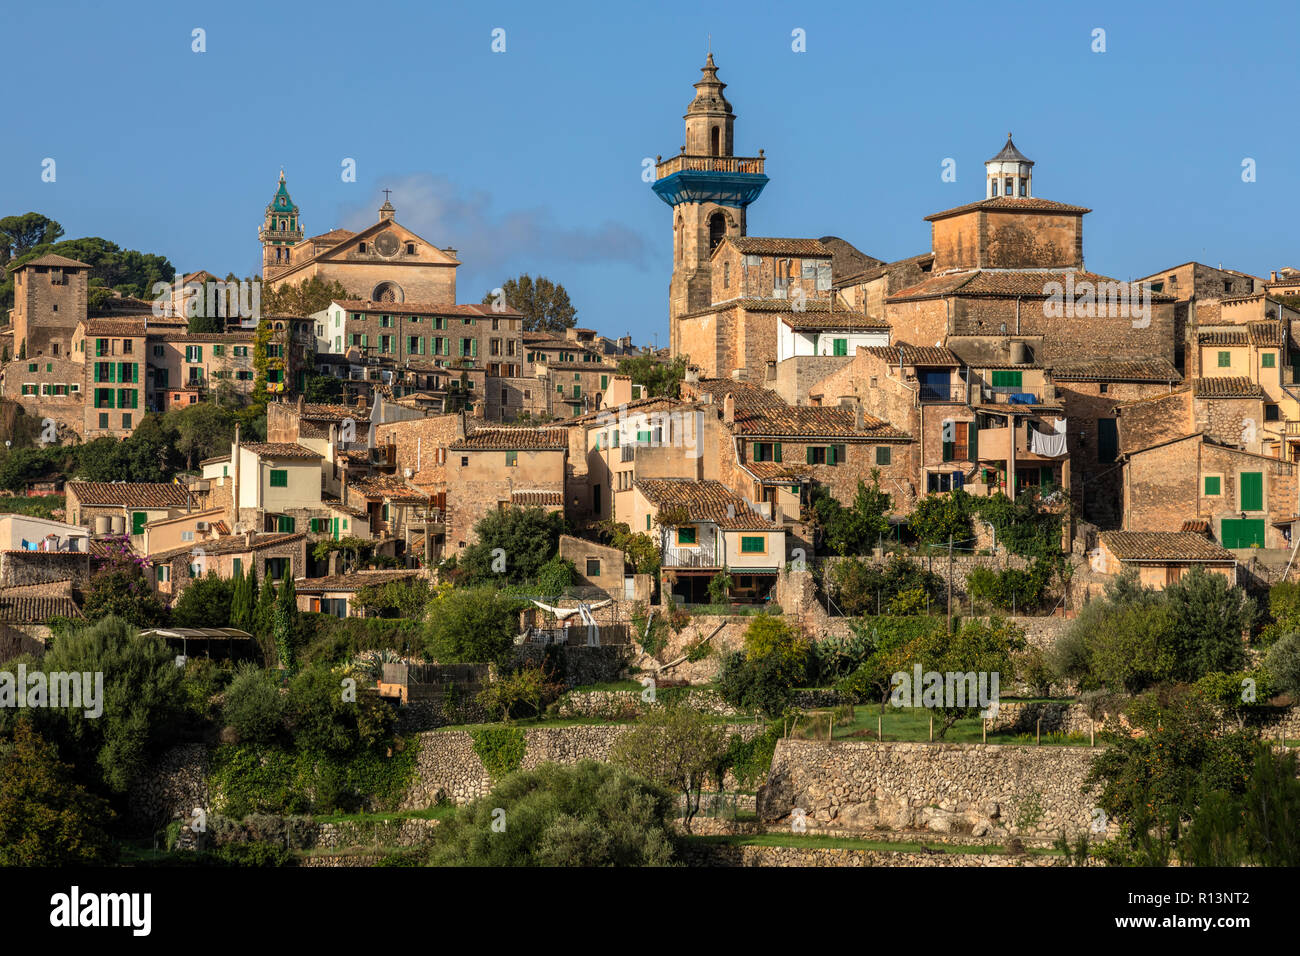 Valldemossa, Mallorca, Balearic Islands, Spain, Europe - Stock Image